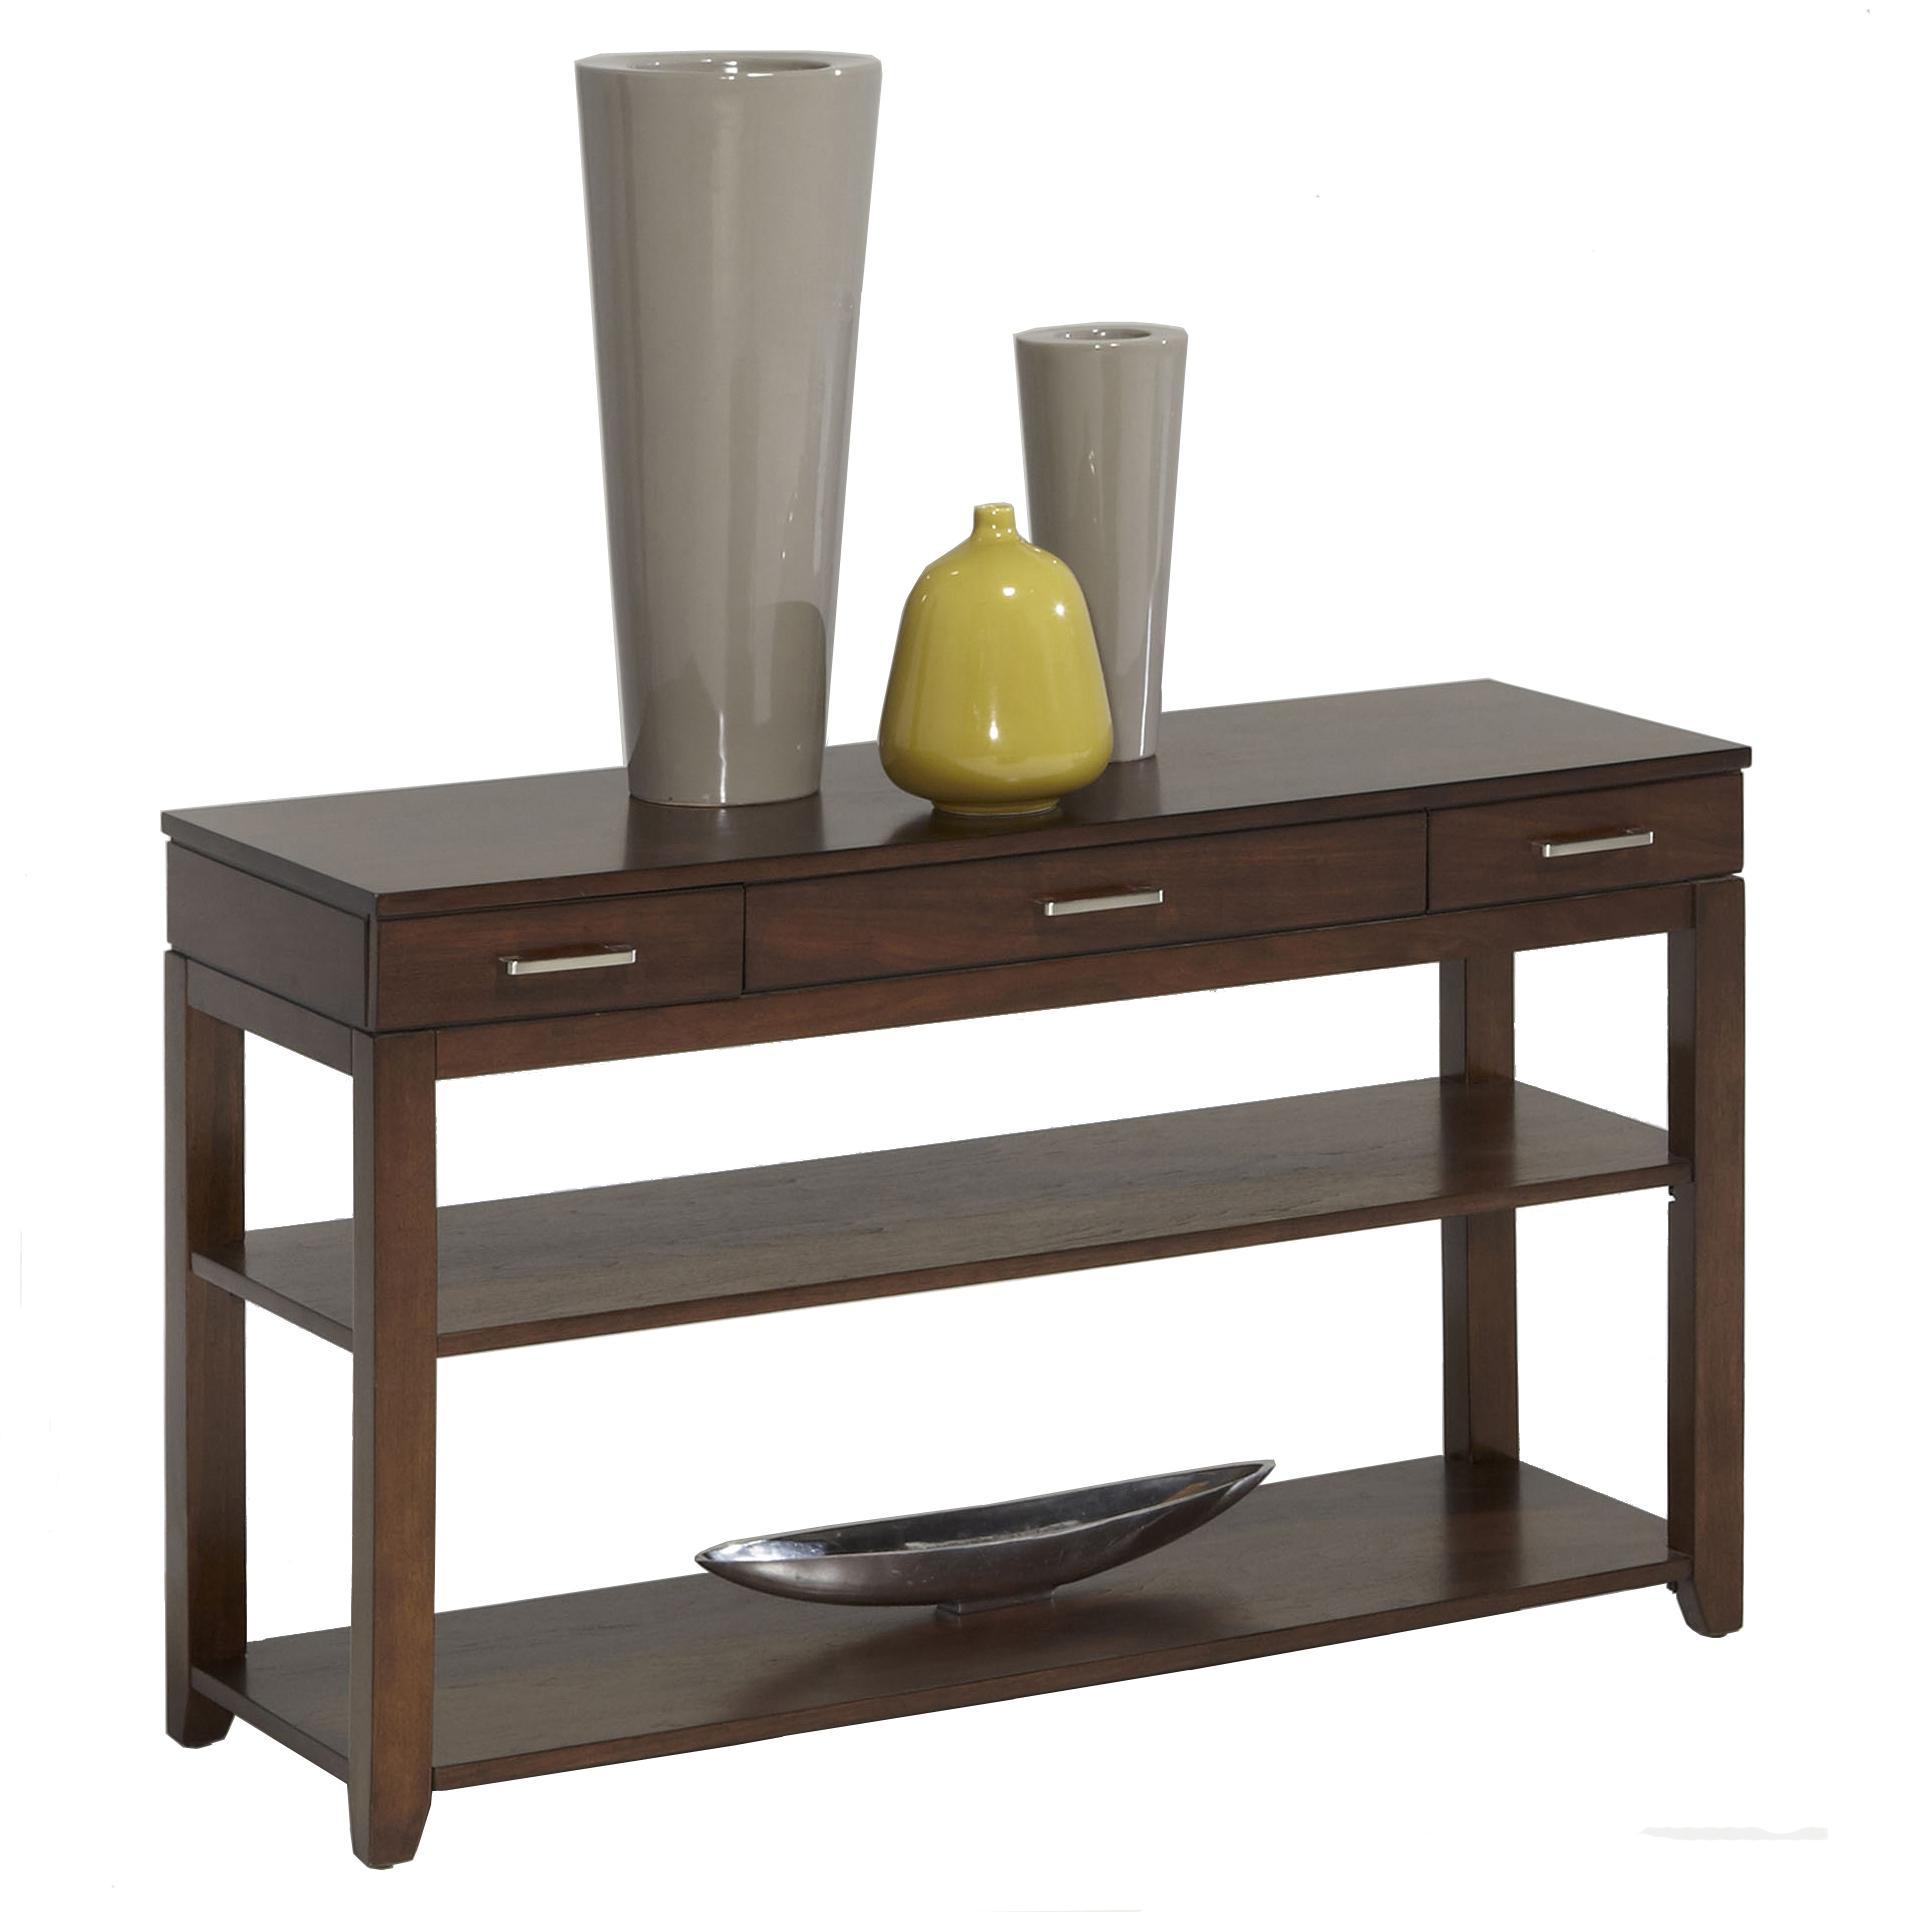 Progressive Furniture Daytona Sofa/Console Table - Item Number: P531-05